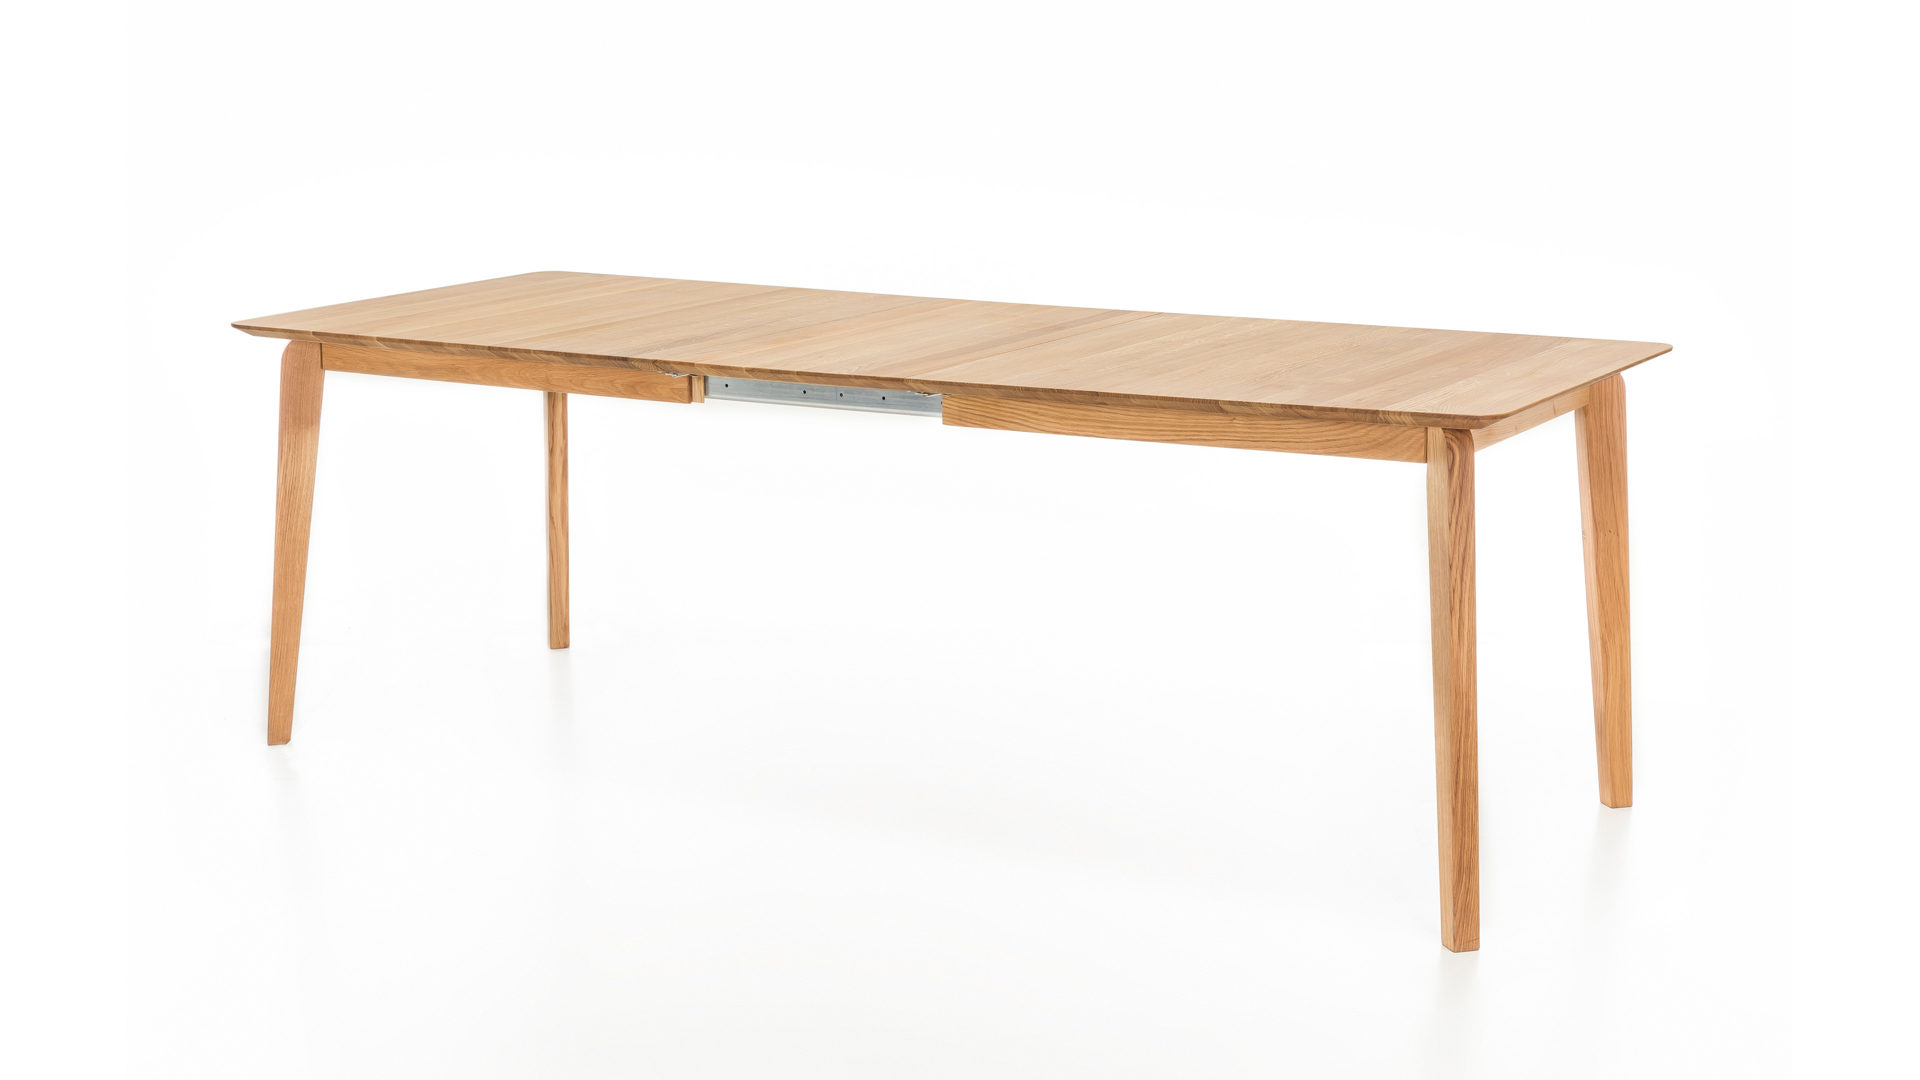 Sitzgruppe Esszimmer Eiche </div>                                   </div> </div>       </div>                      </div> <div class=